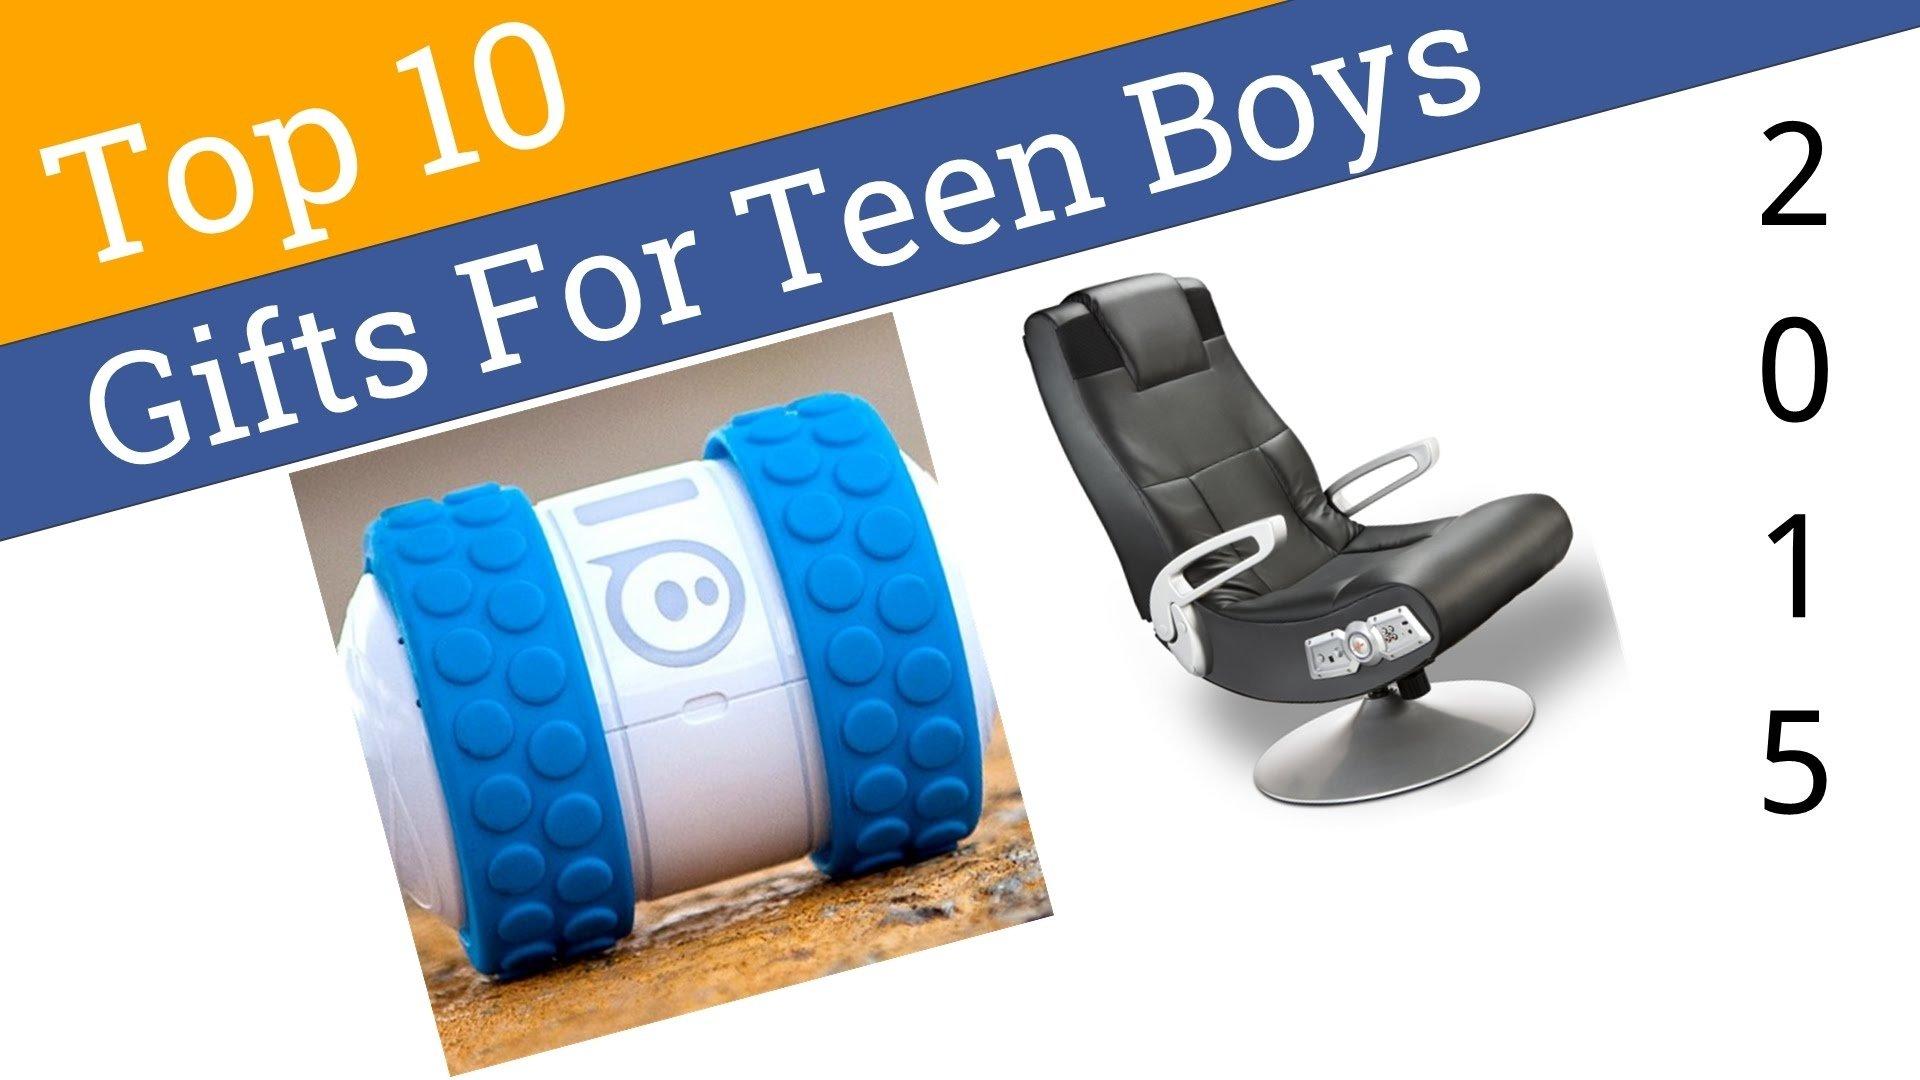 10 Elegant Good Gift Ideas For Teenage Guys 10 best gifts for teen boys 2015 youtube 2 2020